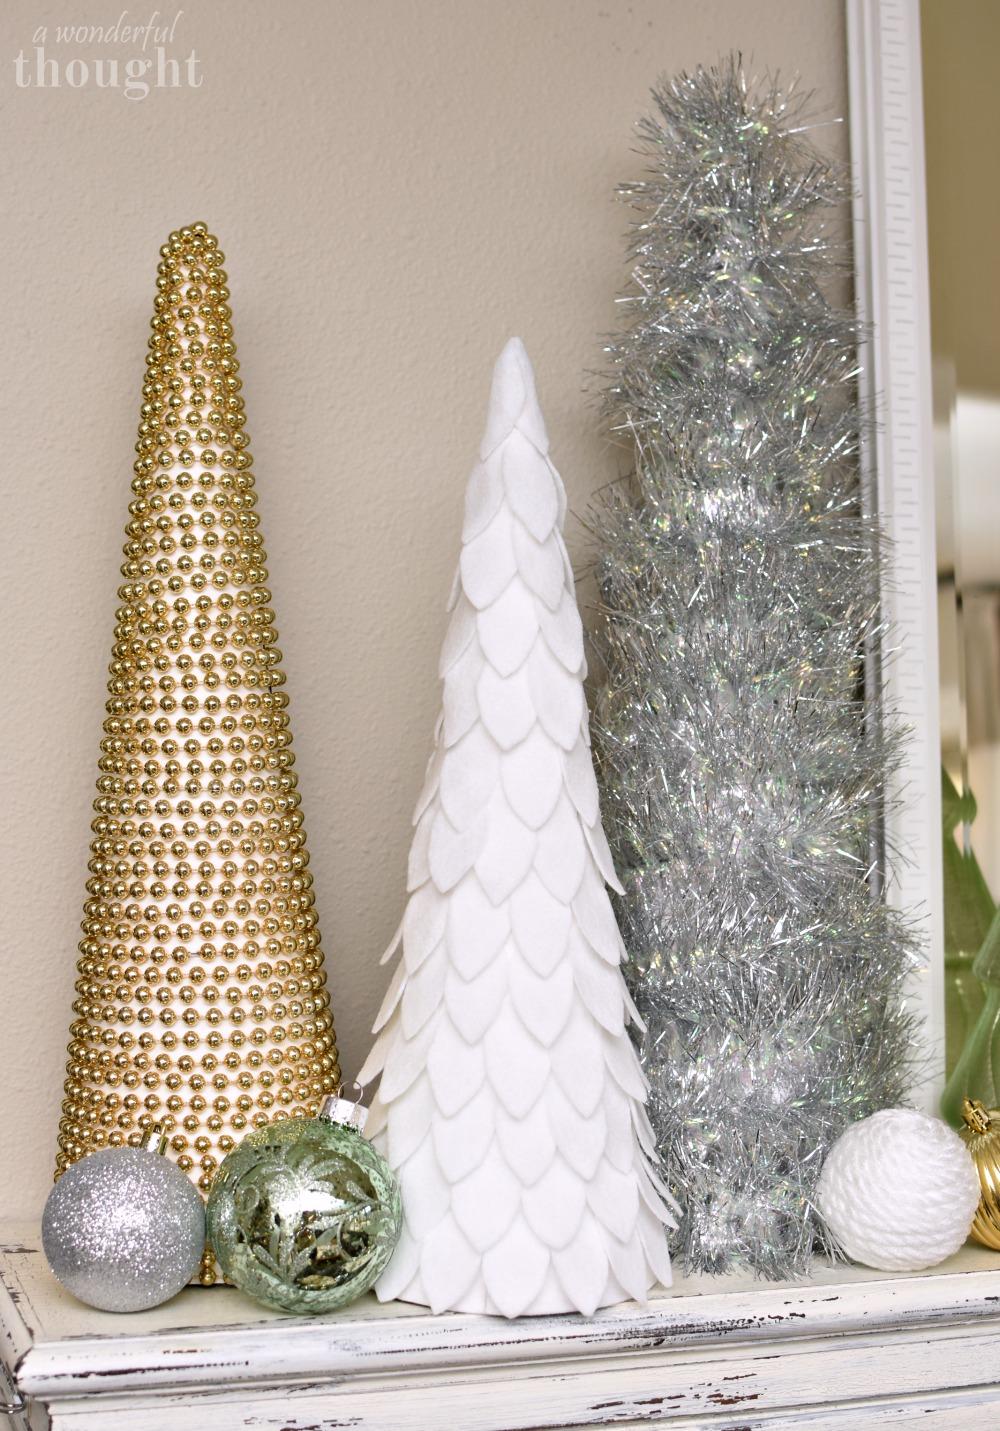 DIY Cone Christmas Trees #diychristmastree #christmasdecor #diyconetree #awonderfulthought